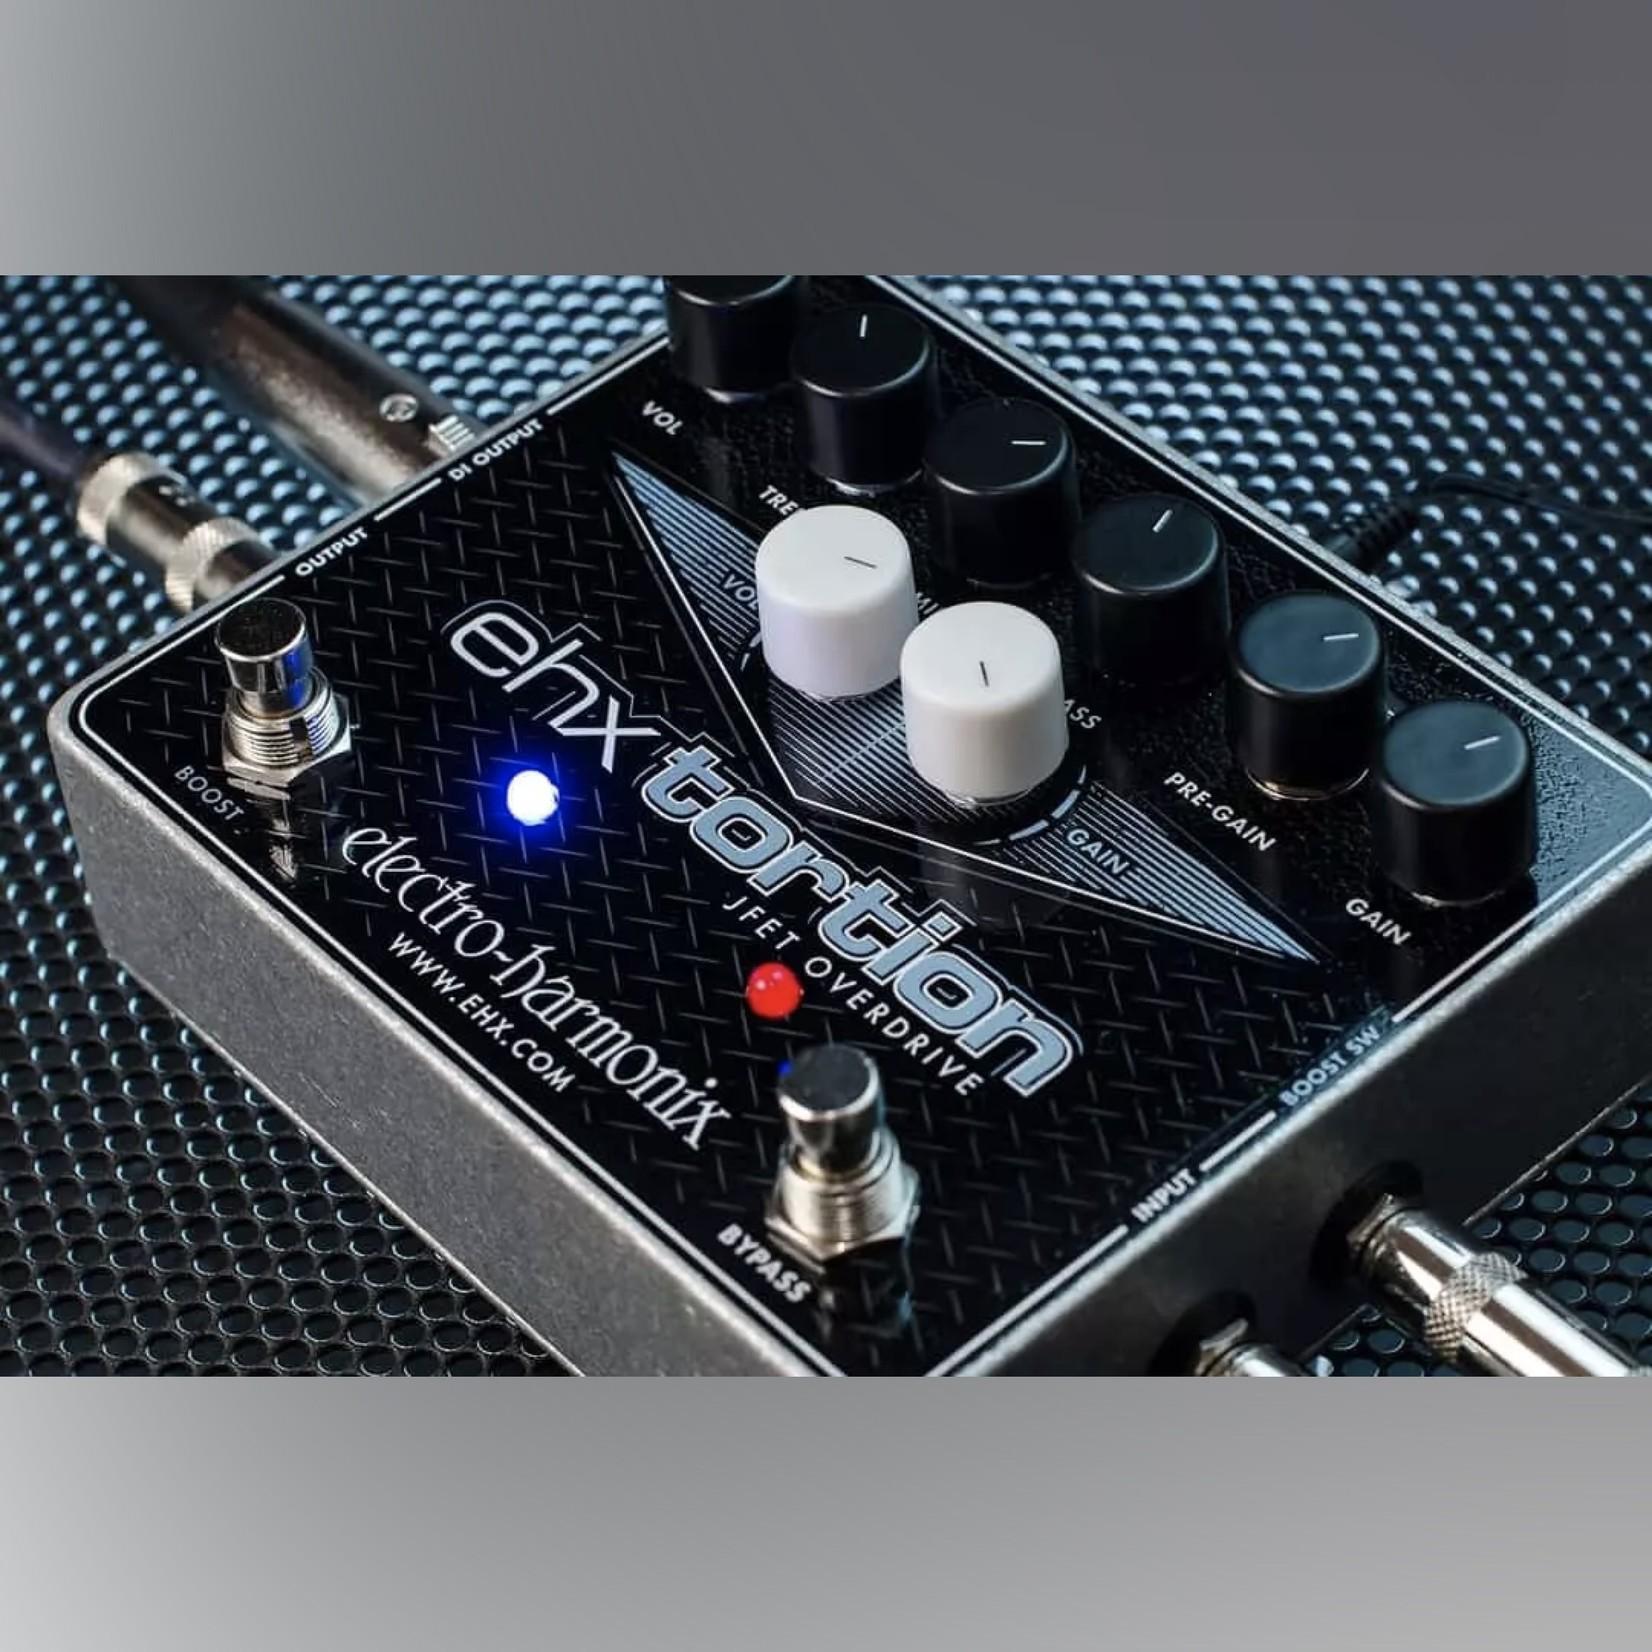 Electro-Harmonix Electro-Harmonix Ehxtortion JFET Overdrive